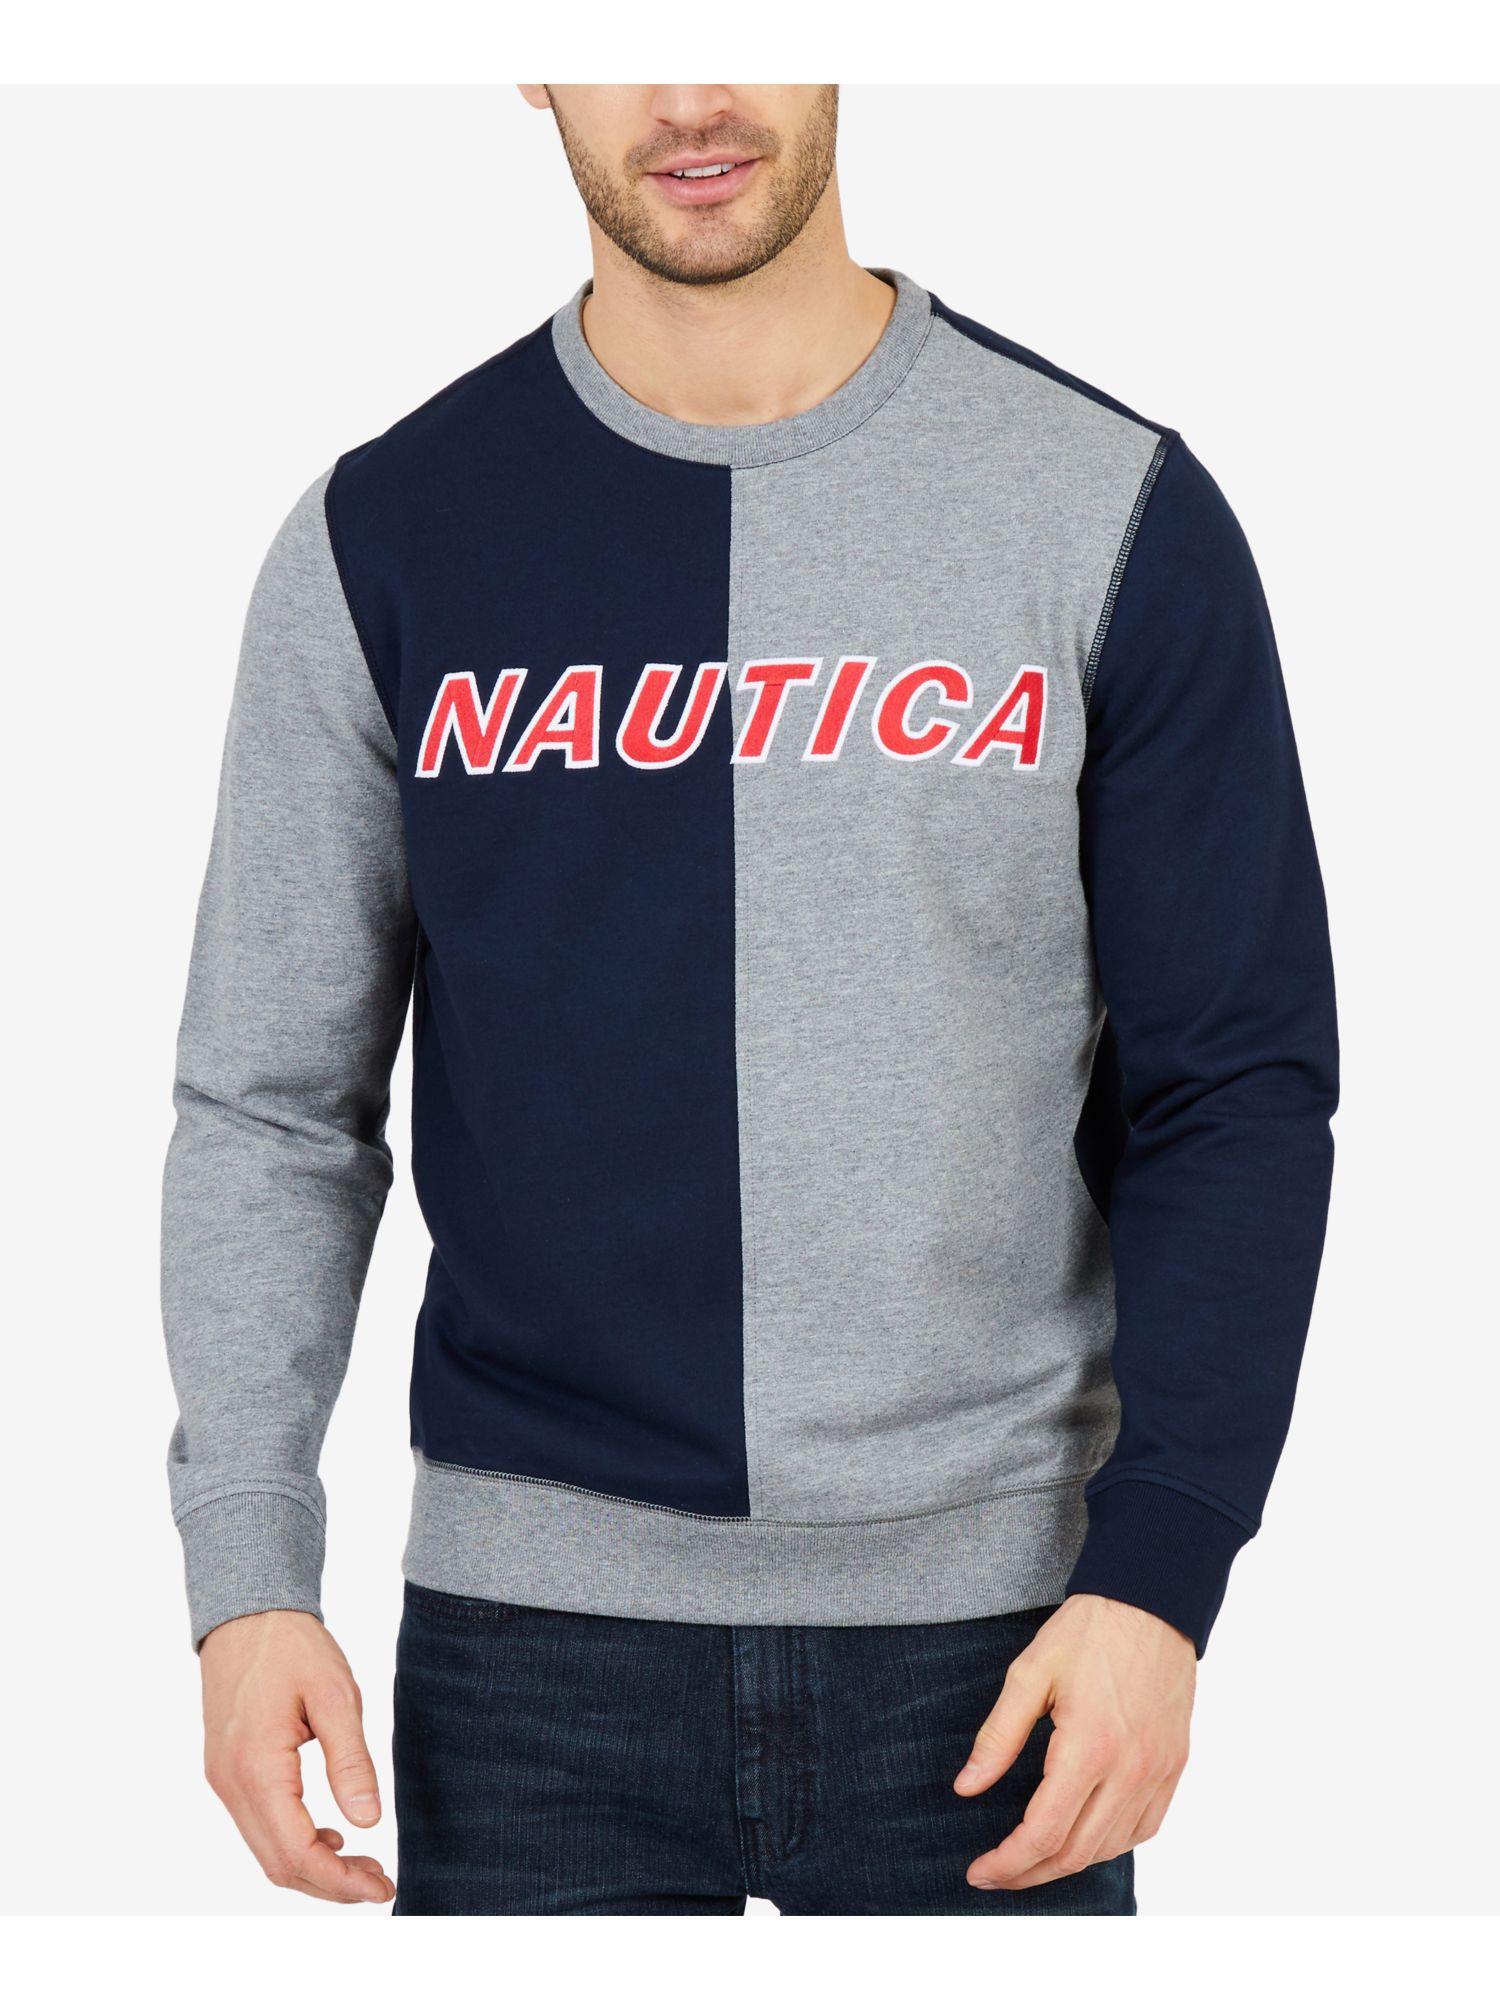 Nautica Mens Colorblocked Lounge Pants Blue Black Mens Size Large New